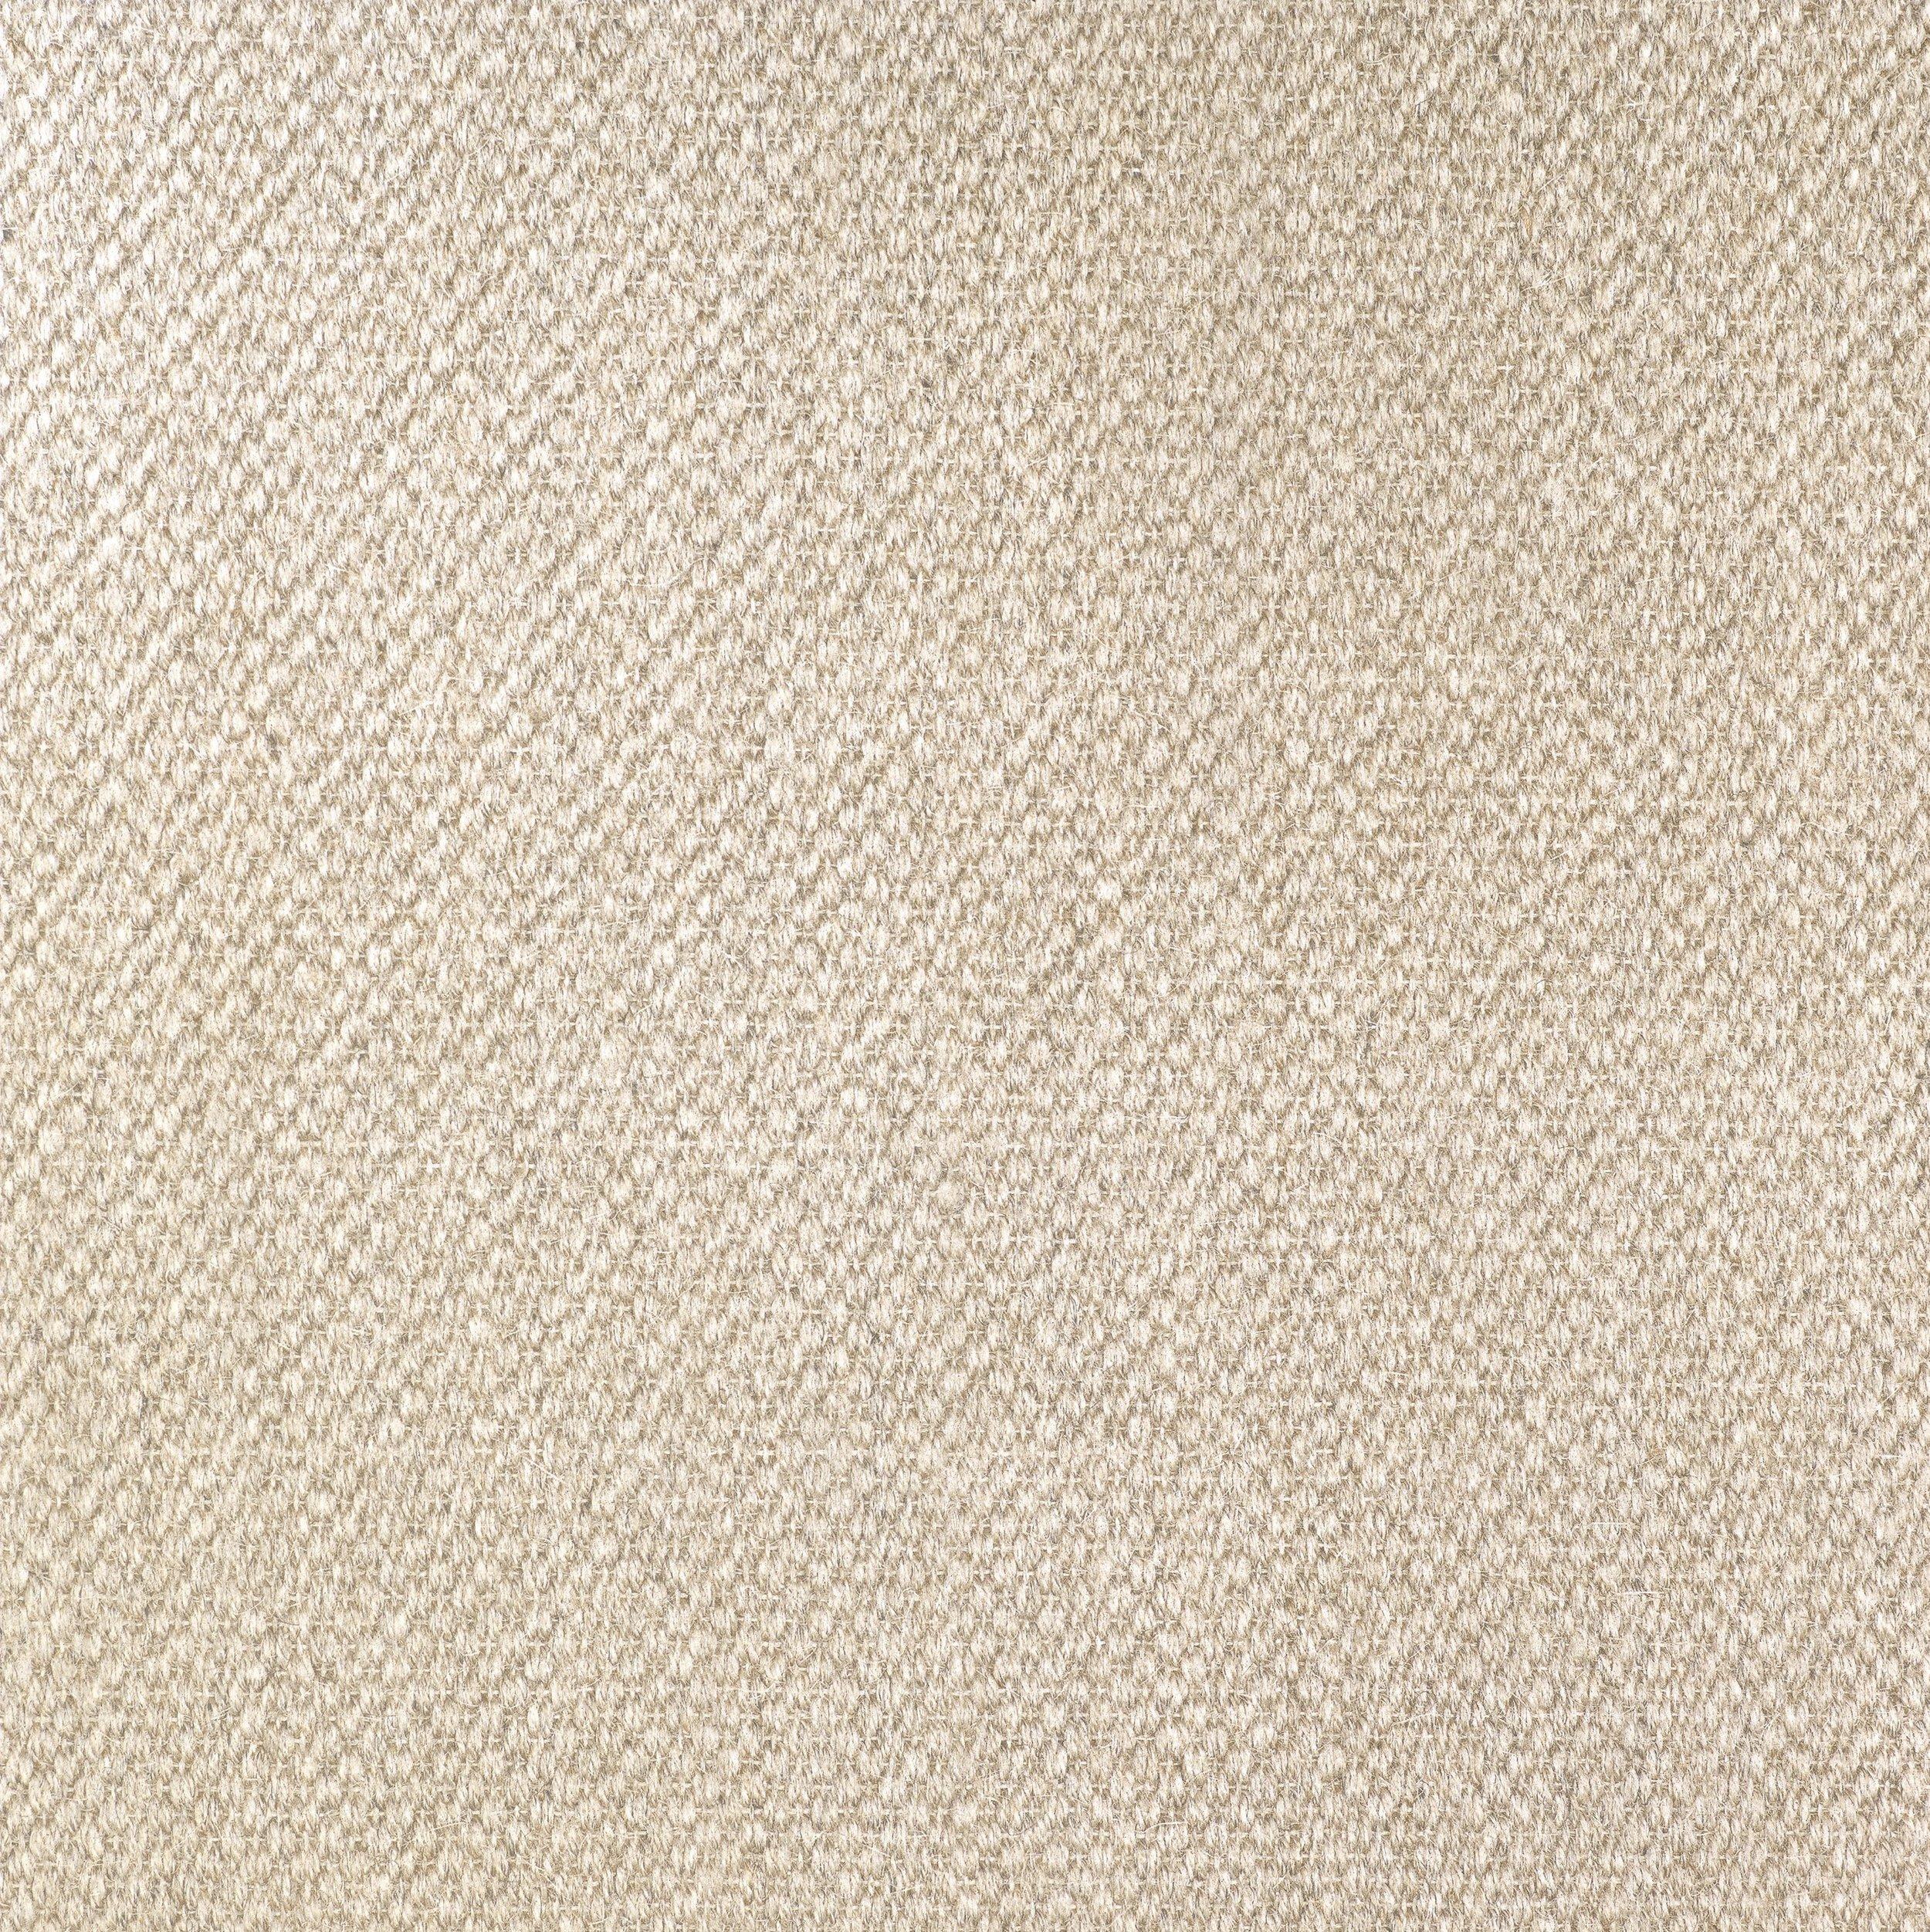 Carpet Natural 60x60cm